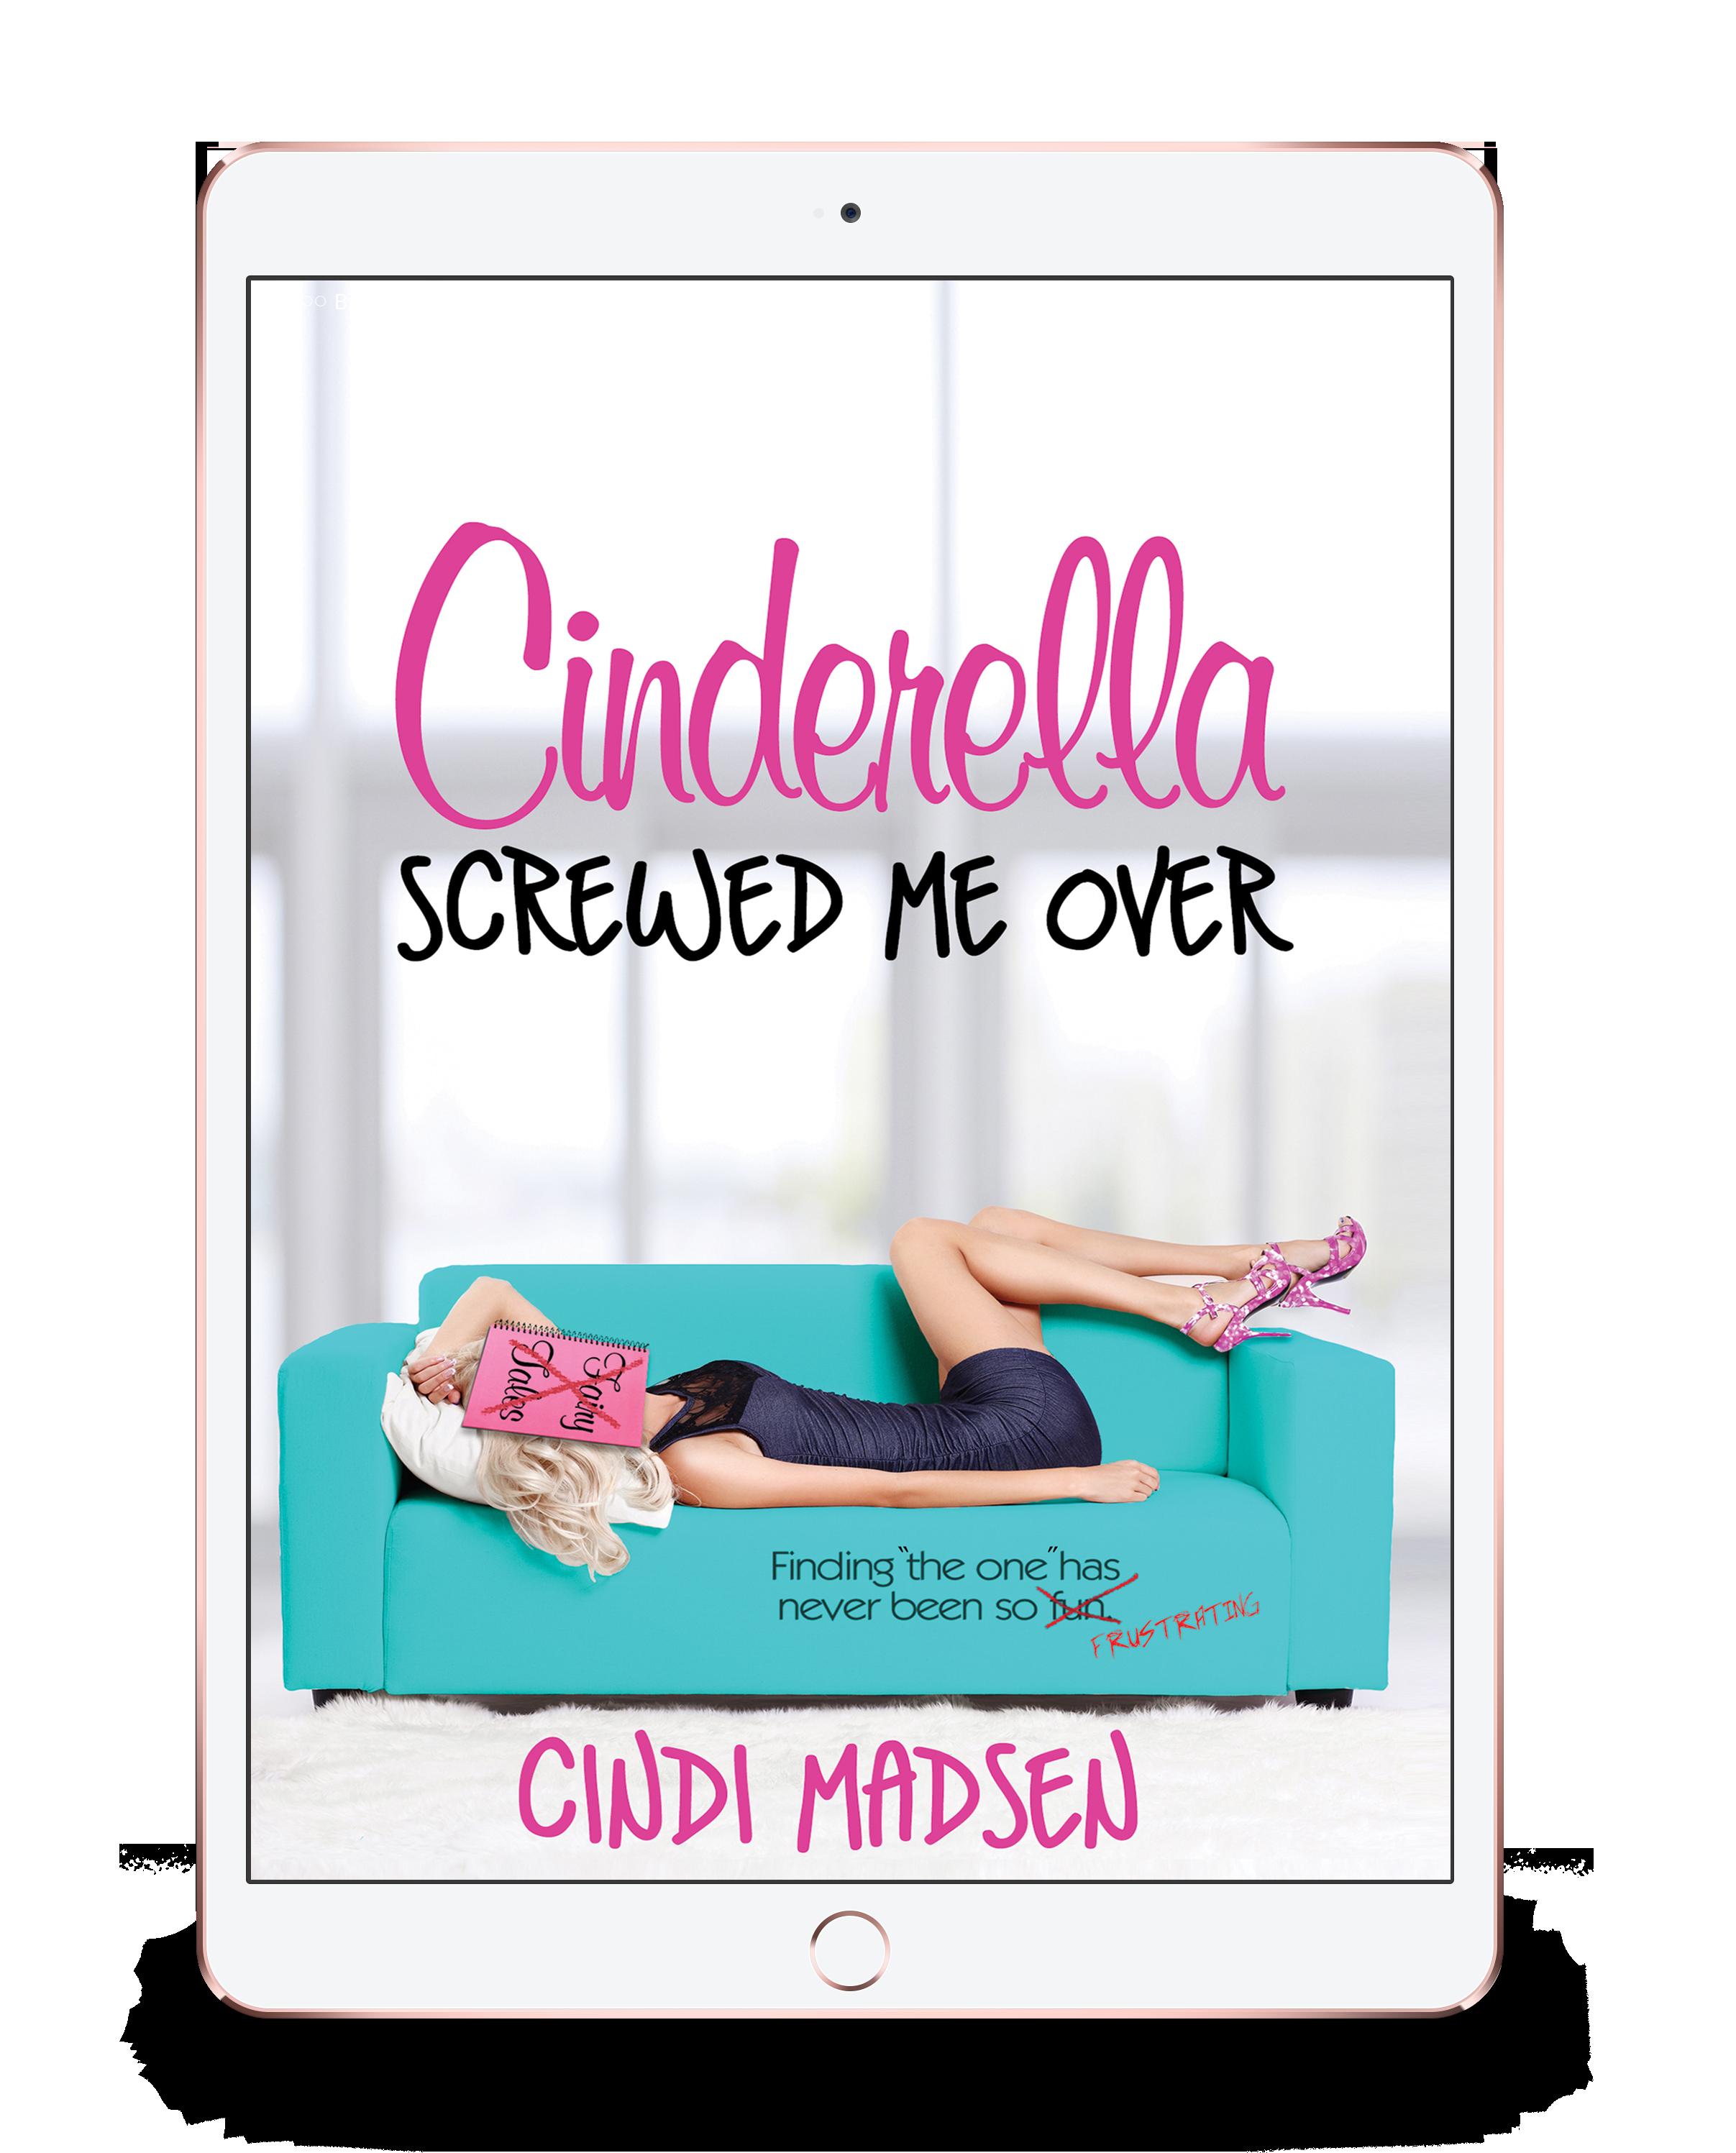 Cinderella Screwed Me Over iPad